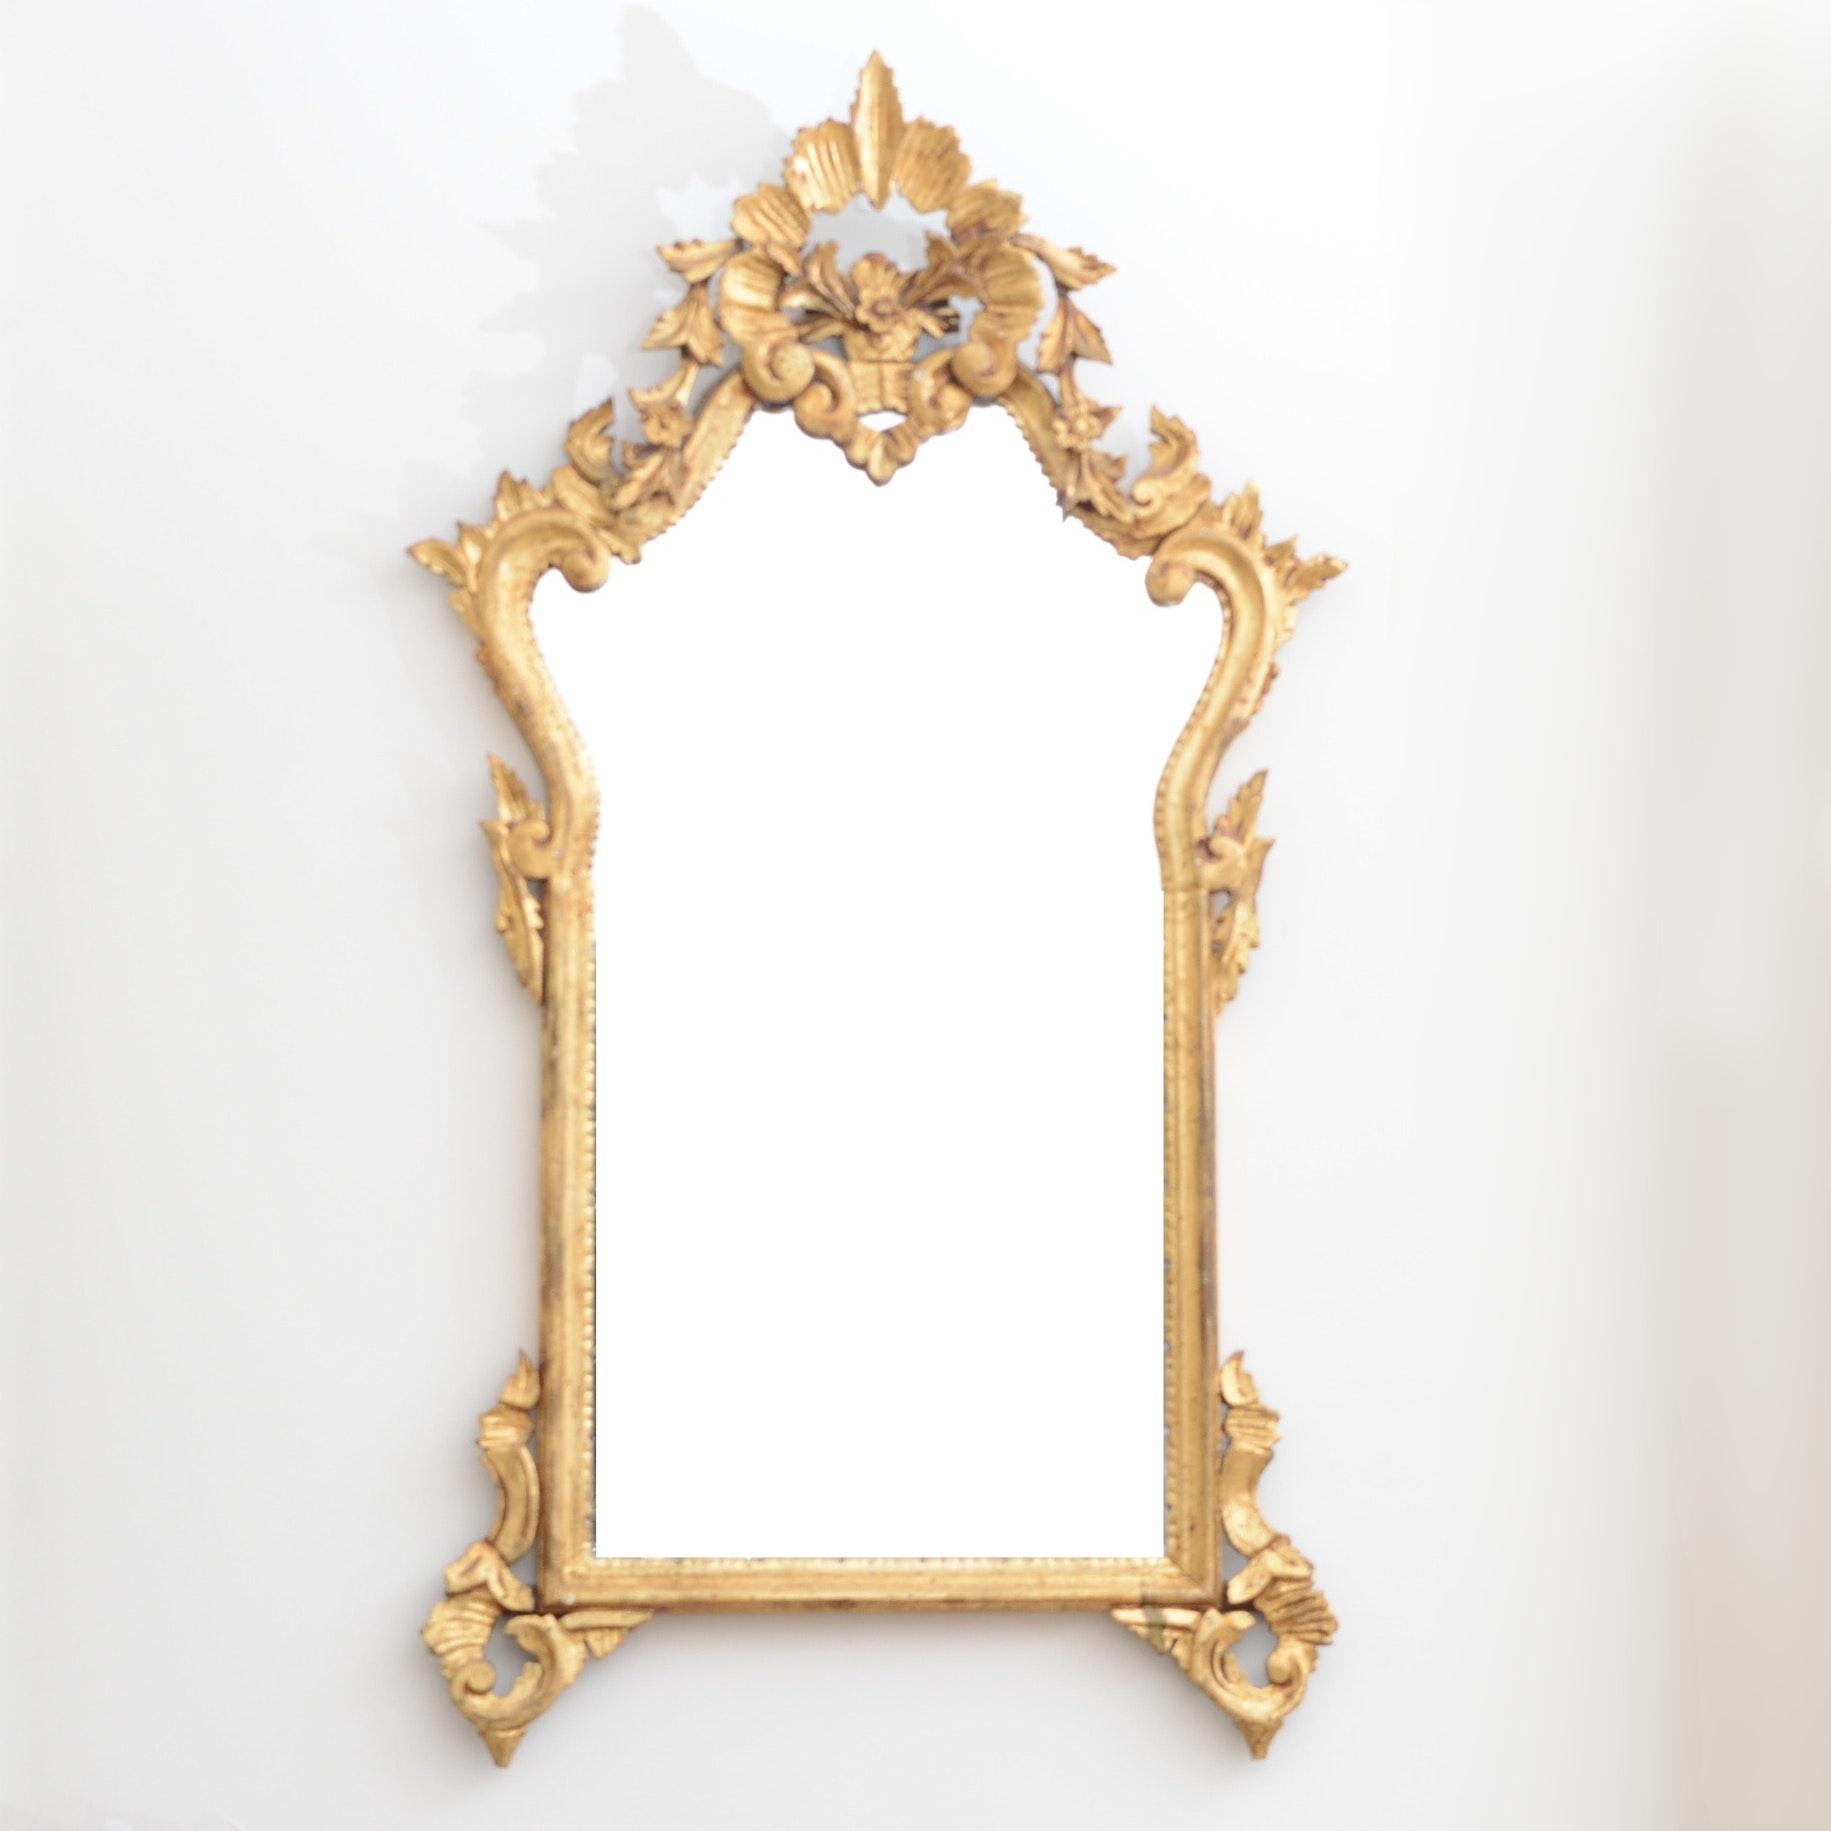 Vintage Gold Tone Wood Framed Wall Mirror